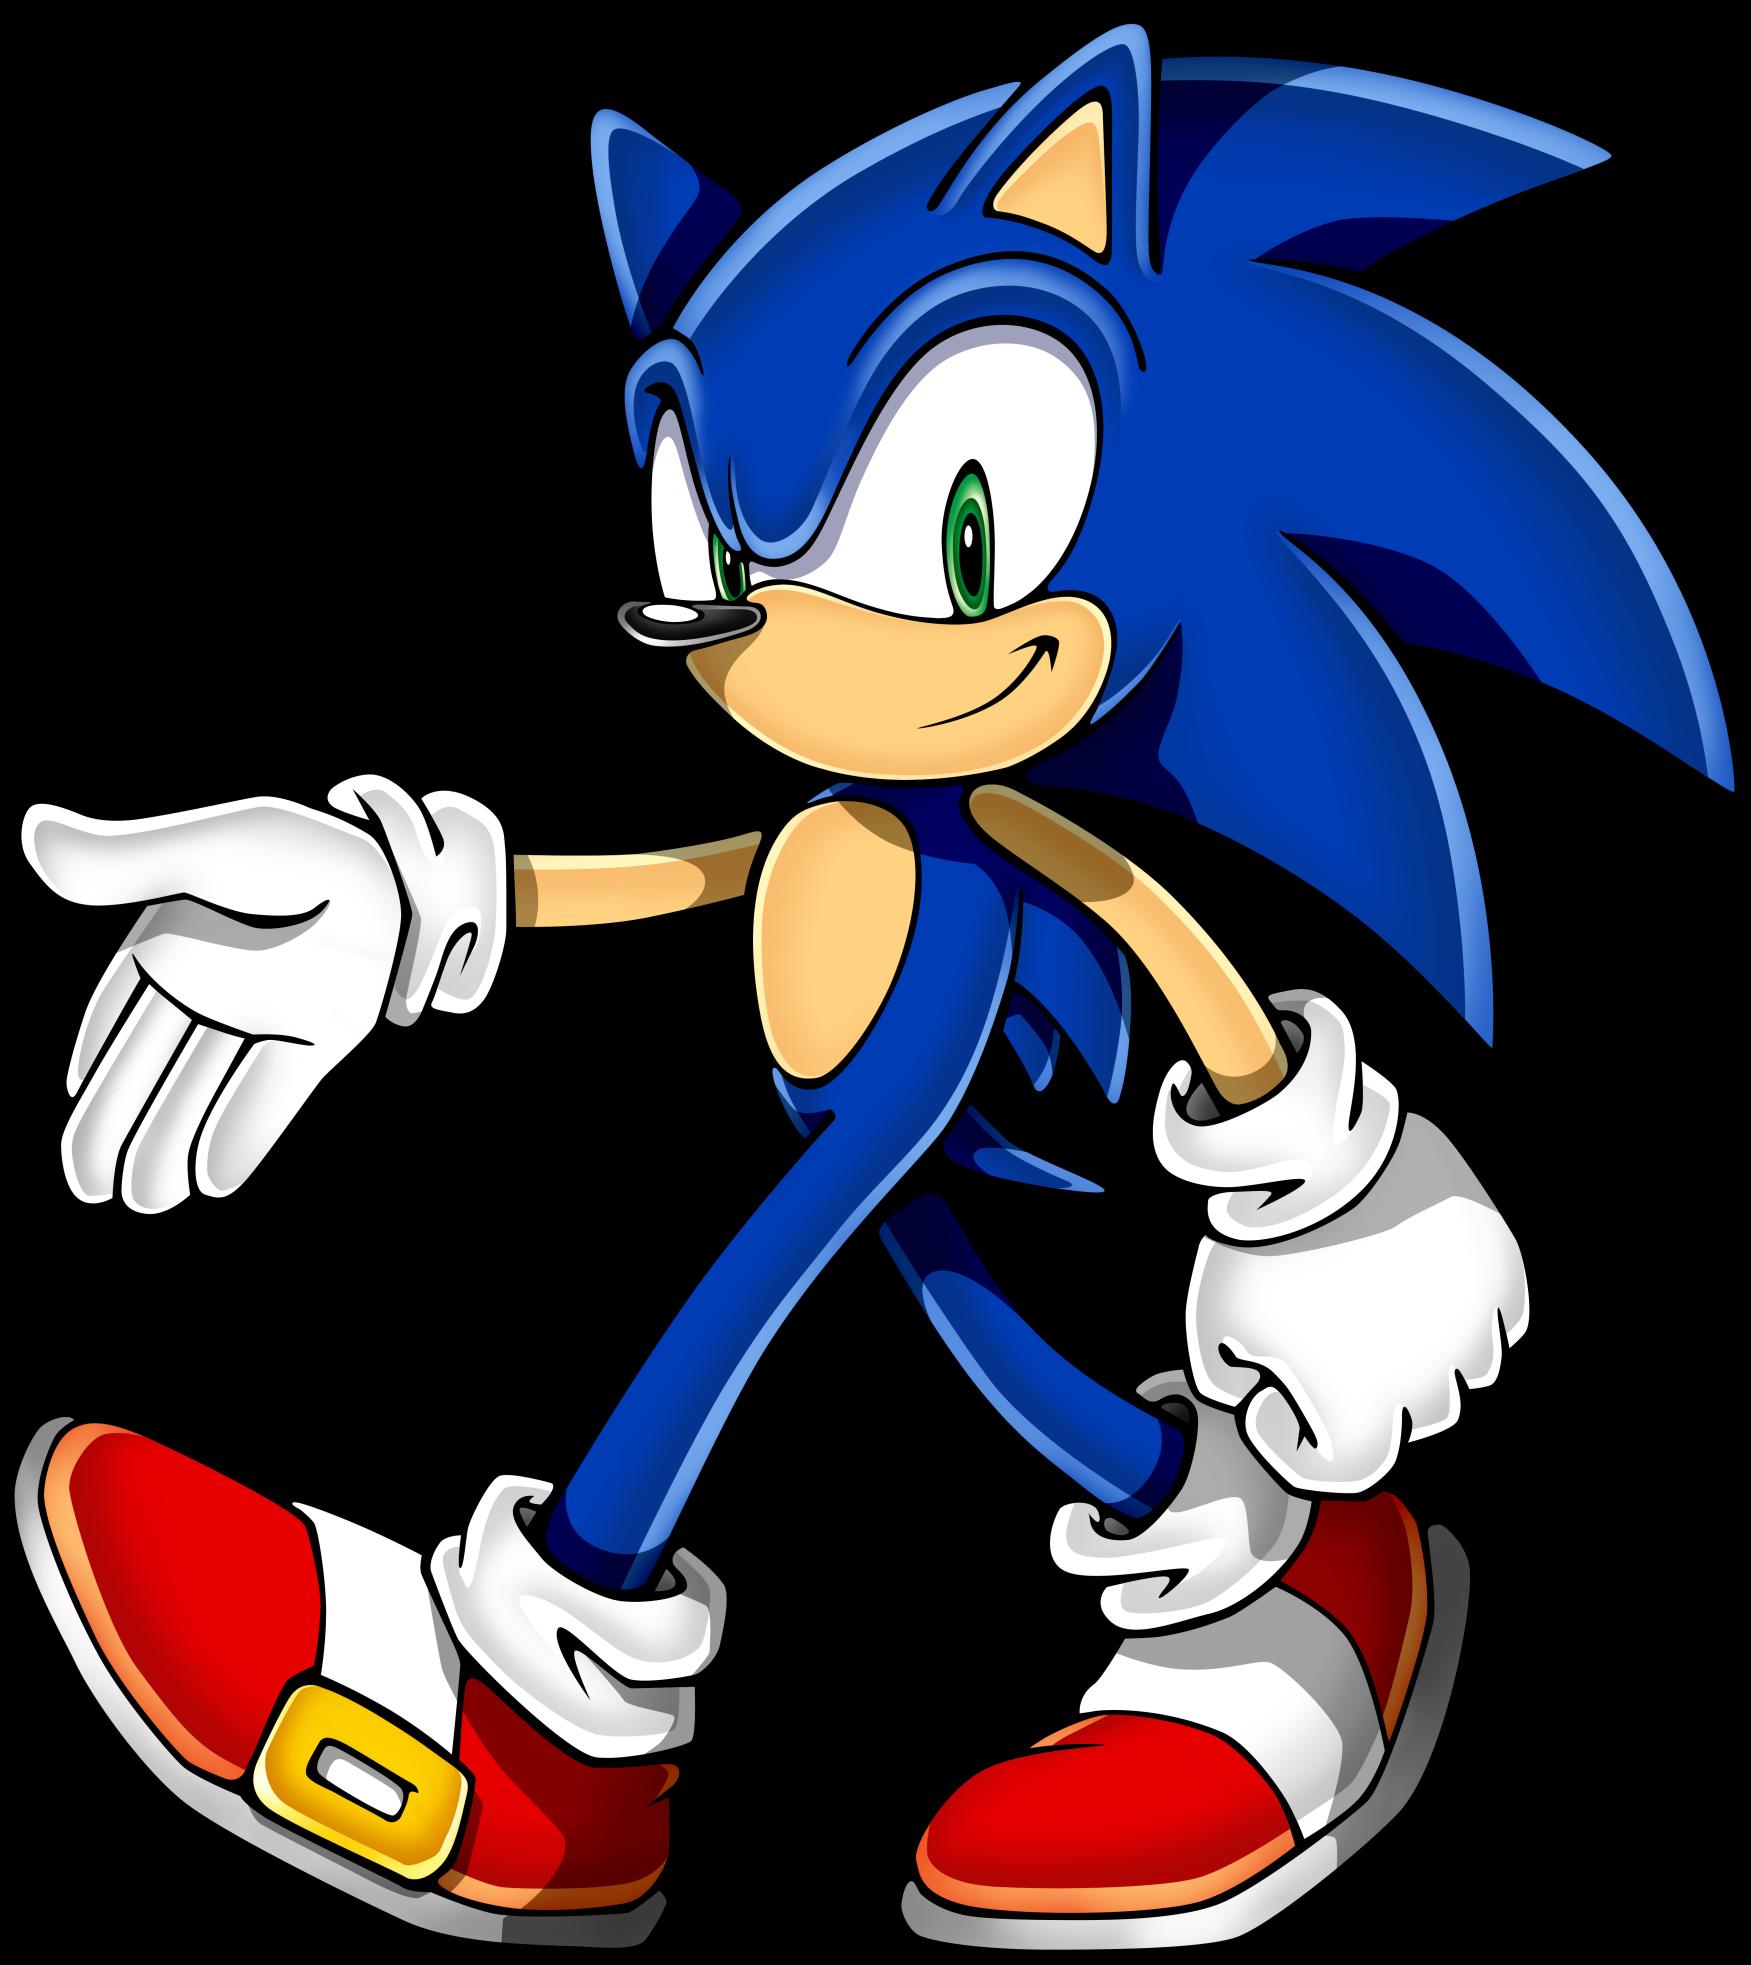 Sonic the Hedgehog (character) - Wikipedia